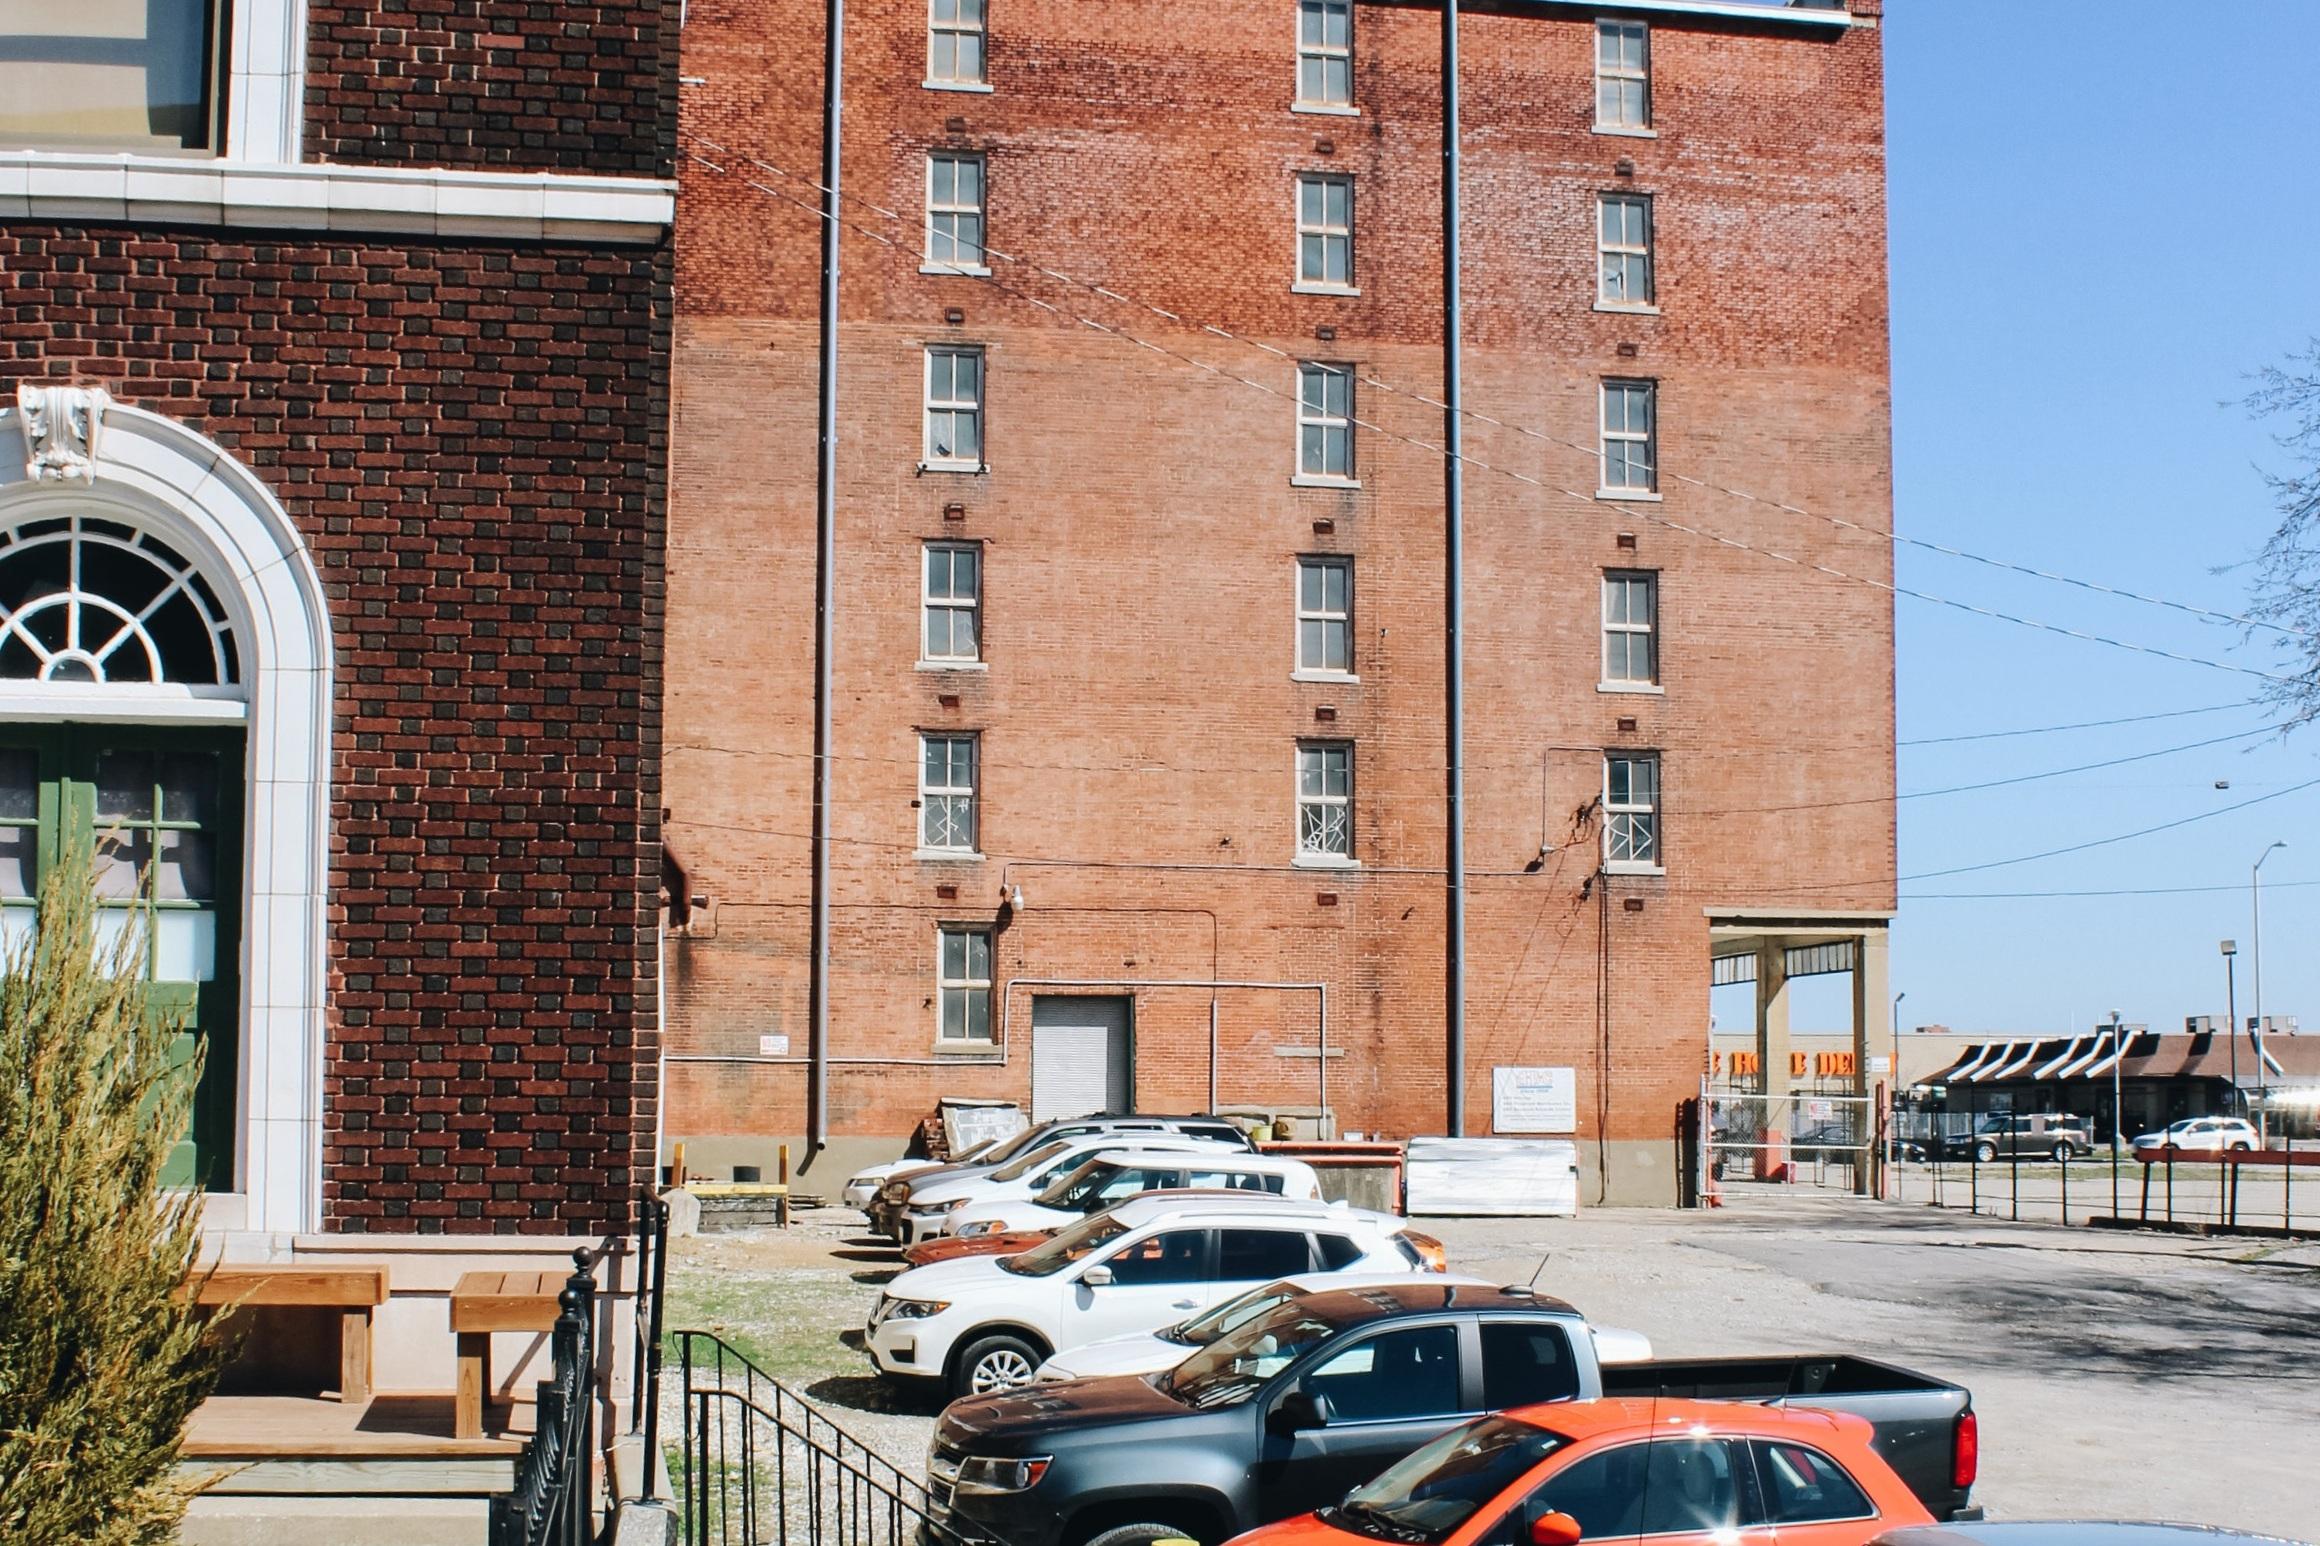 drexel-hall-parking.jpg